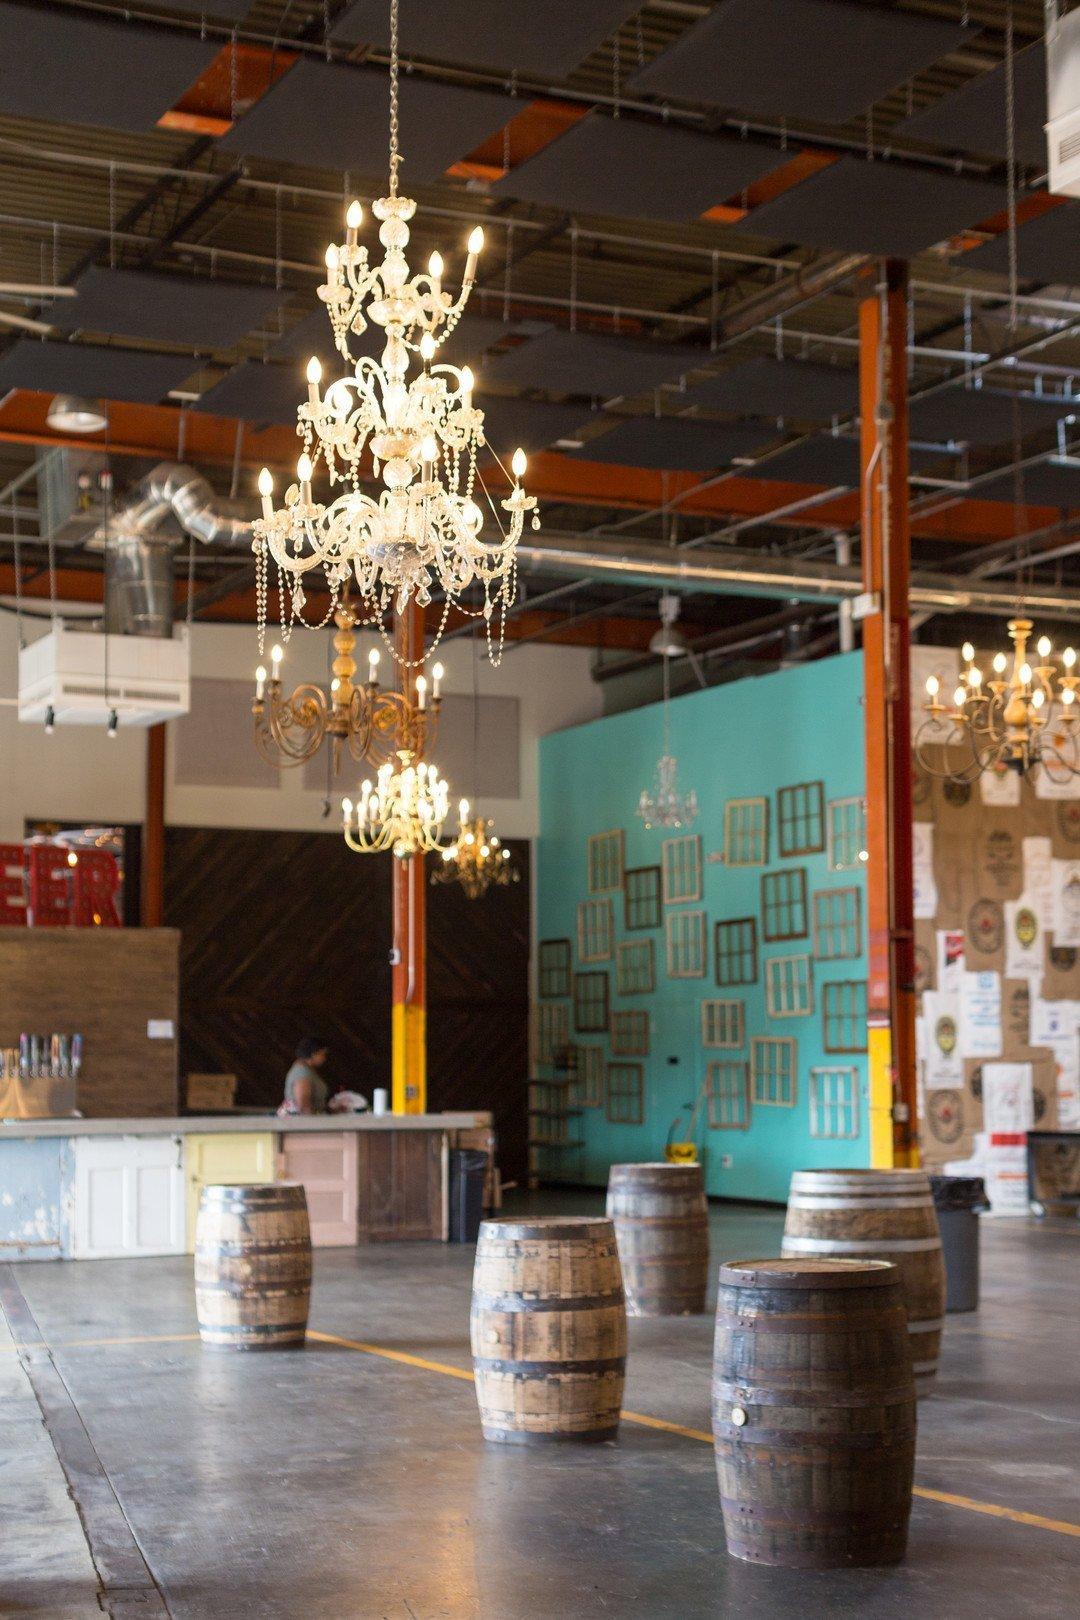 Monday Night brewery wedding